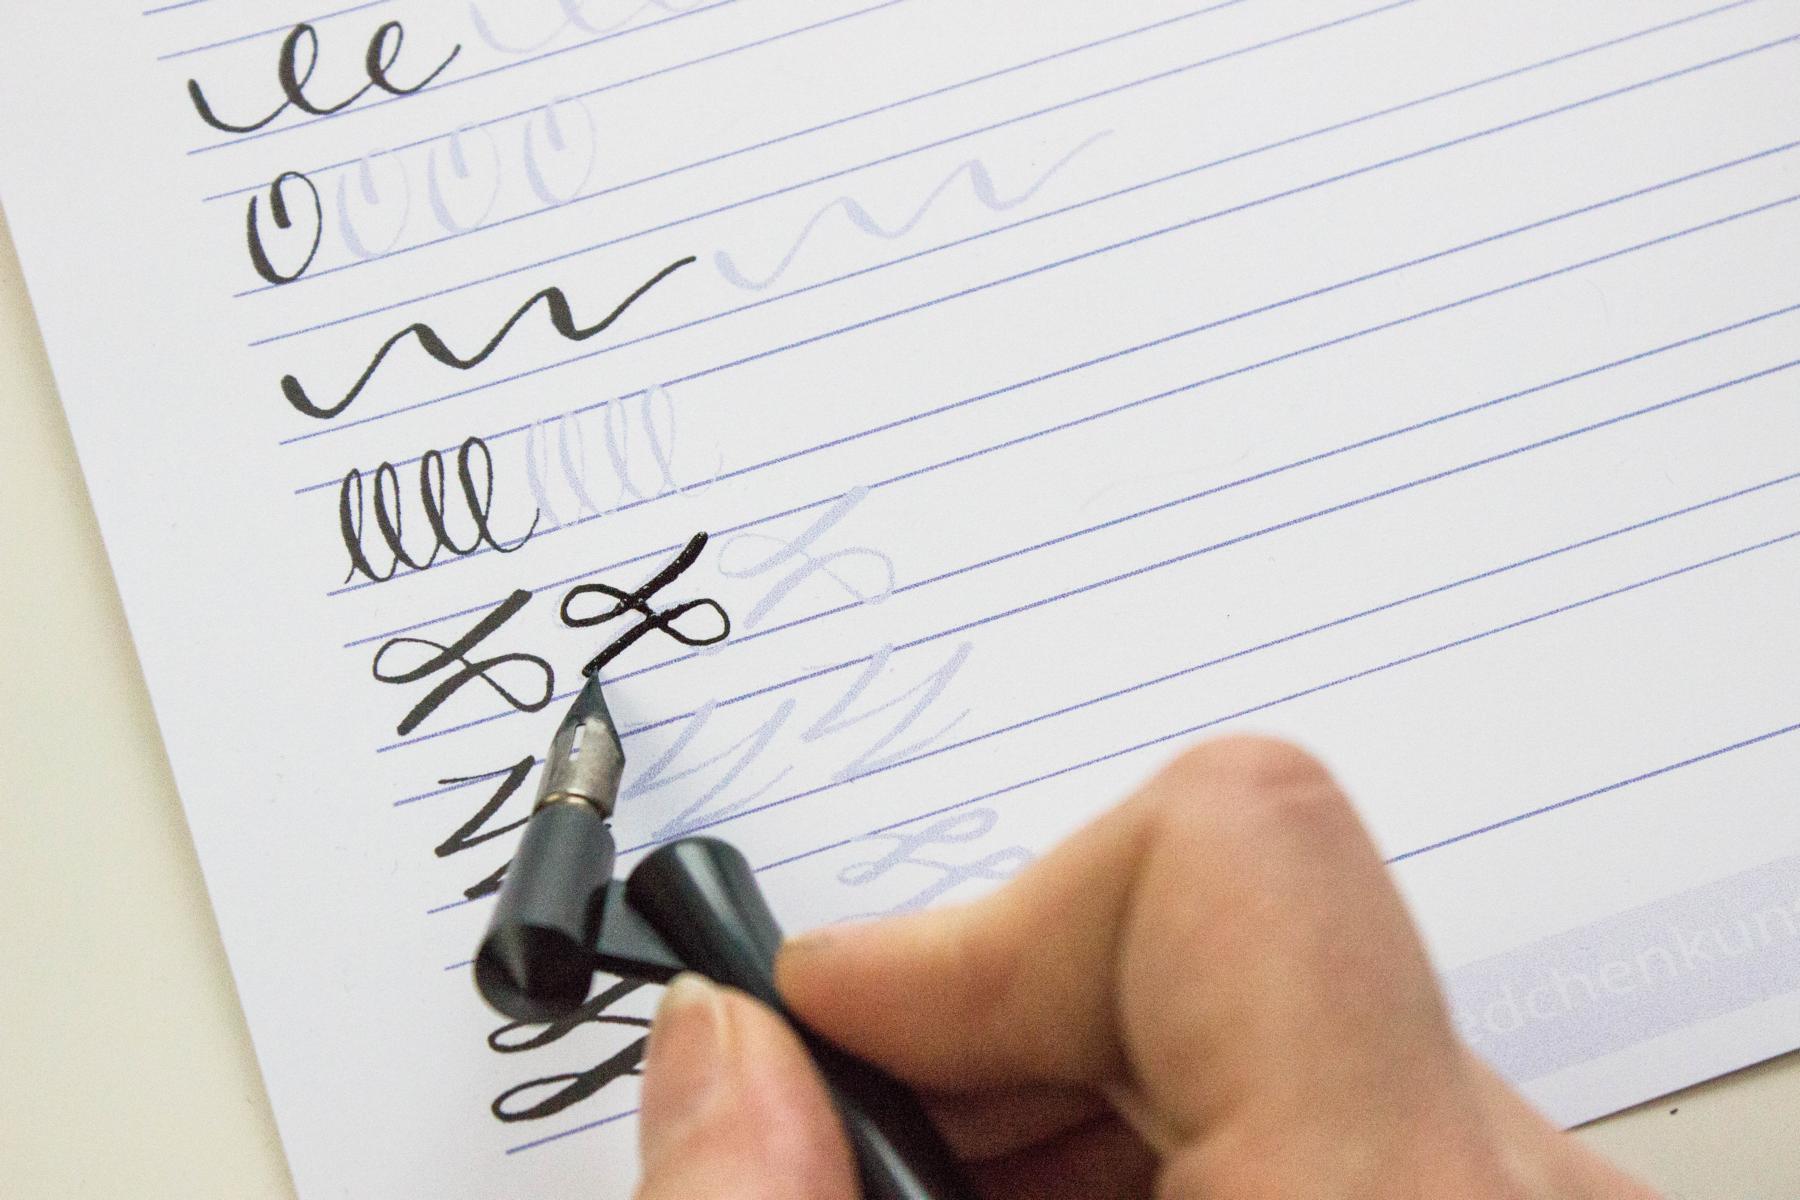 k1600_kalligrafie-uebungsblatt-5-of-5